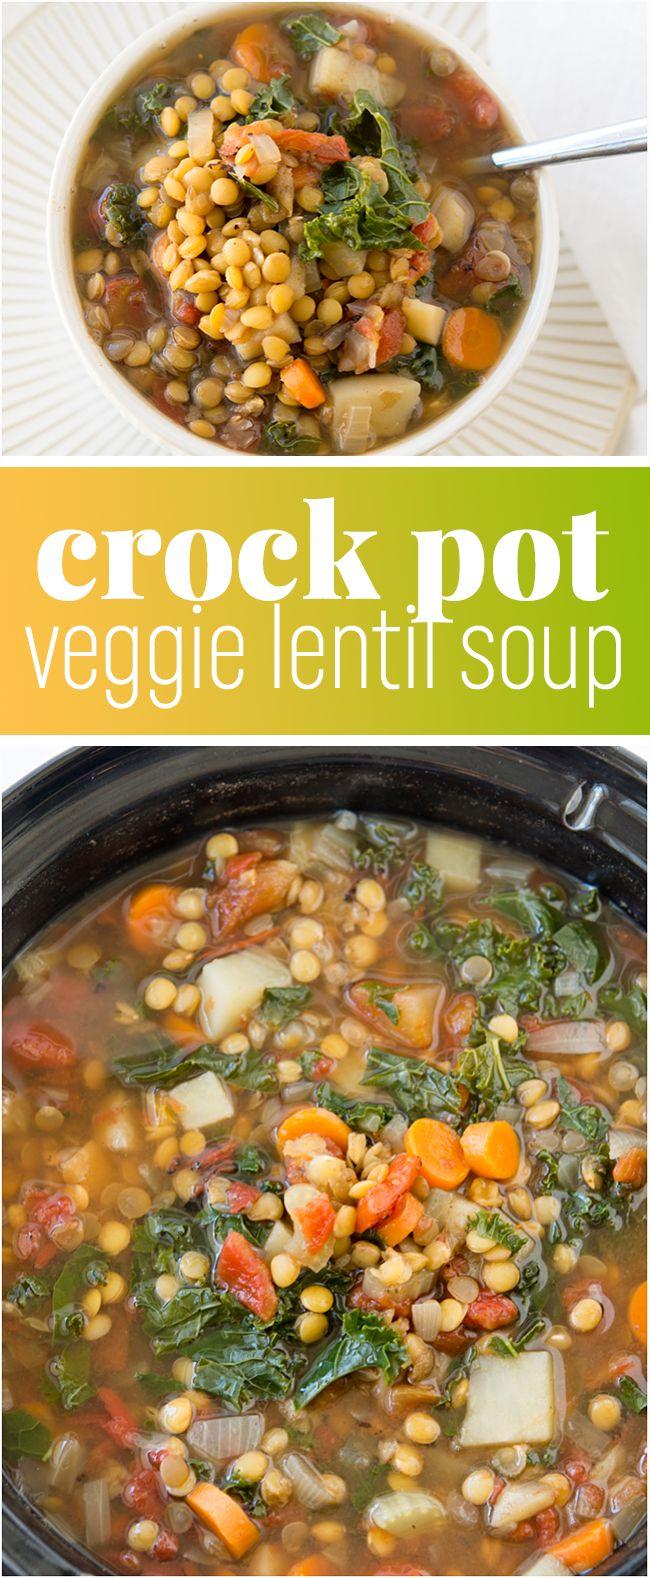 Crock Pot Vegetable Lentil Soup Recipe Crock Pot Vegetables Plant Based Meals And Lentil Soup Recipes